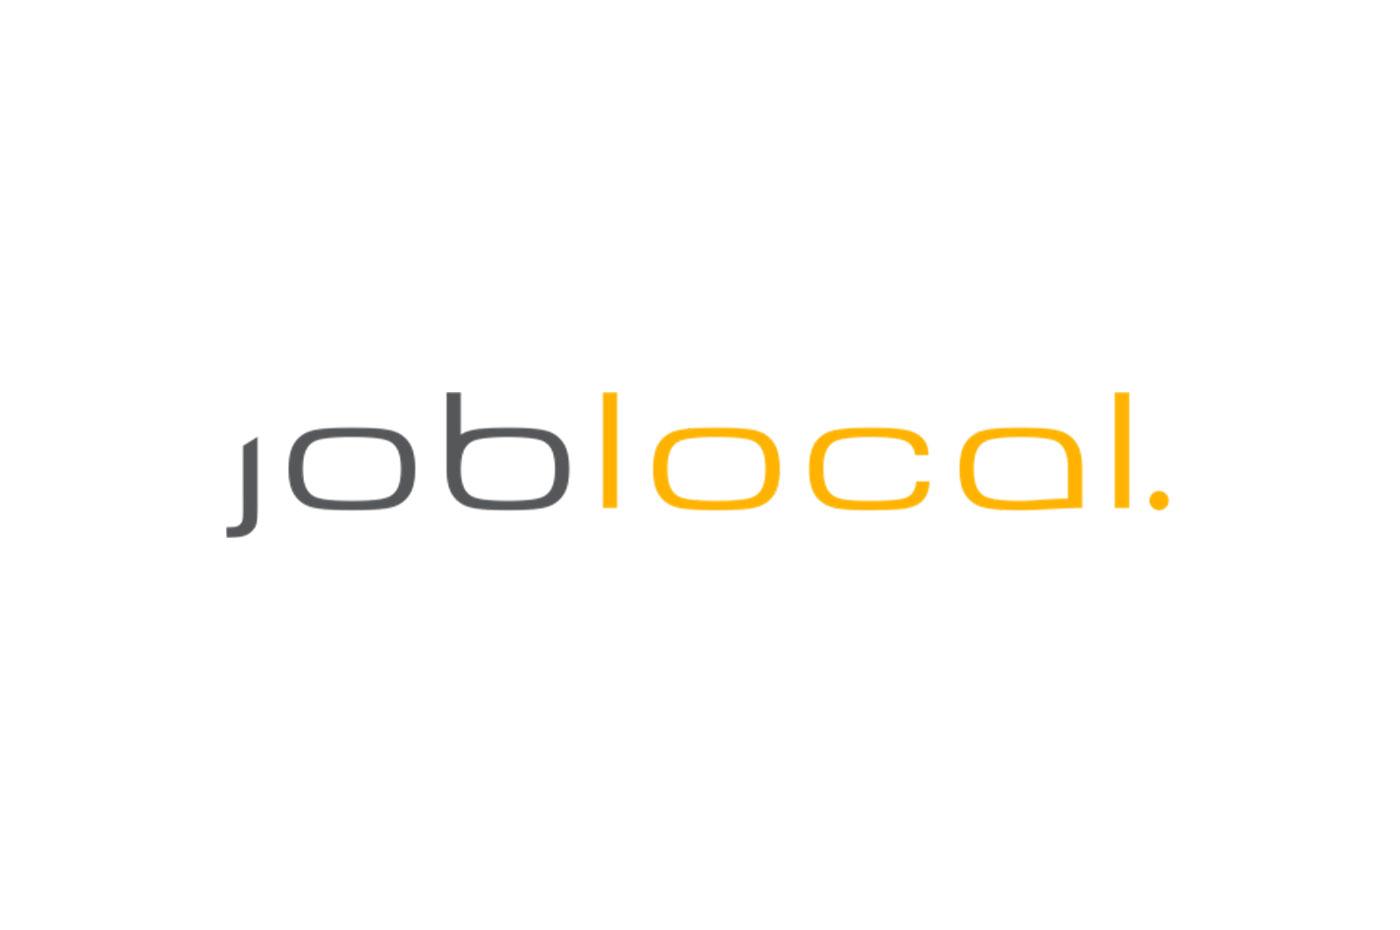 Joblocal